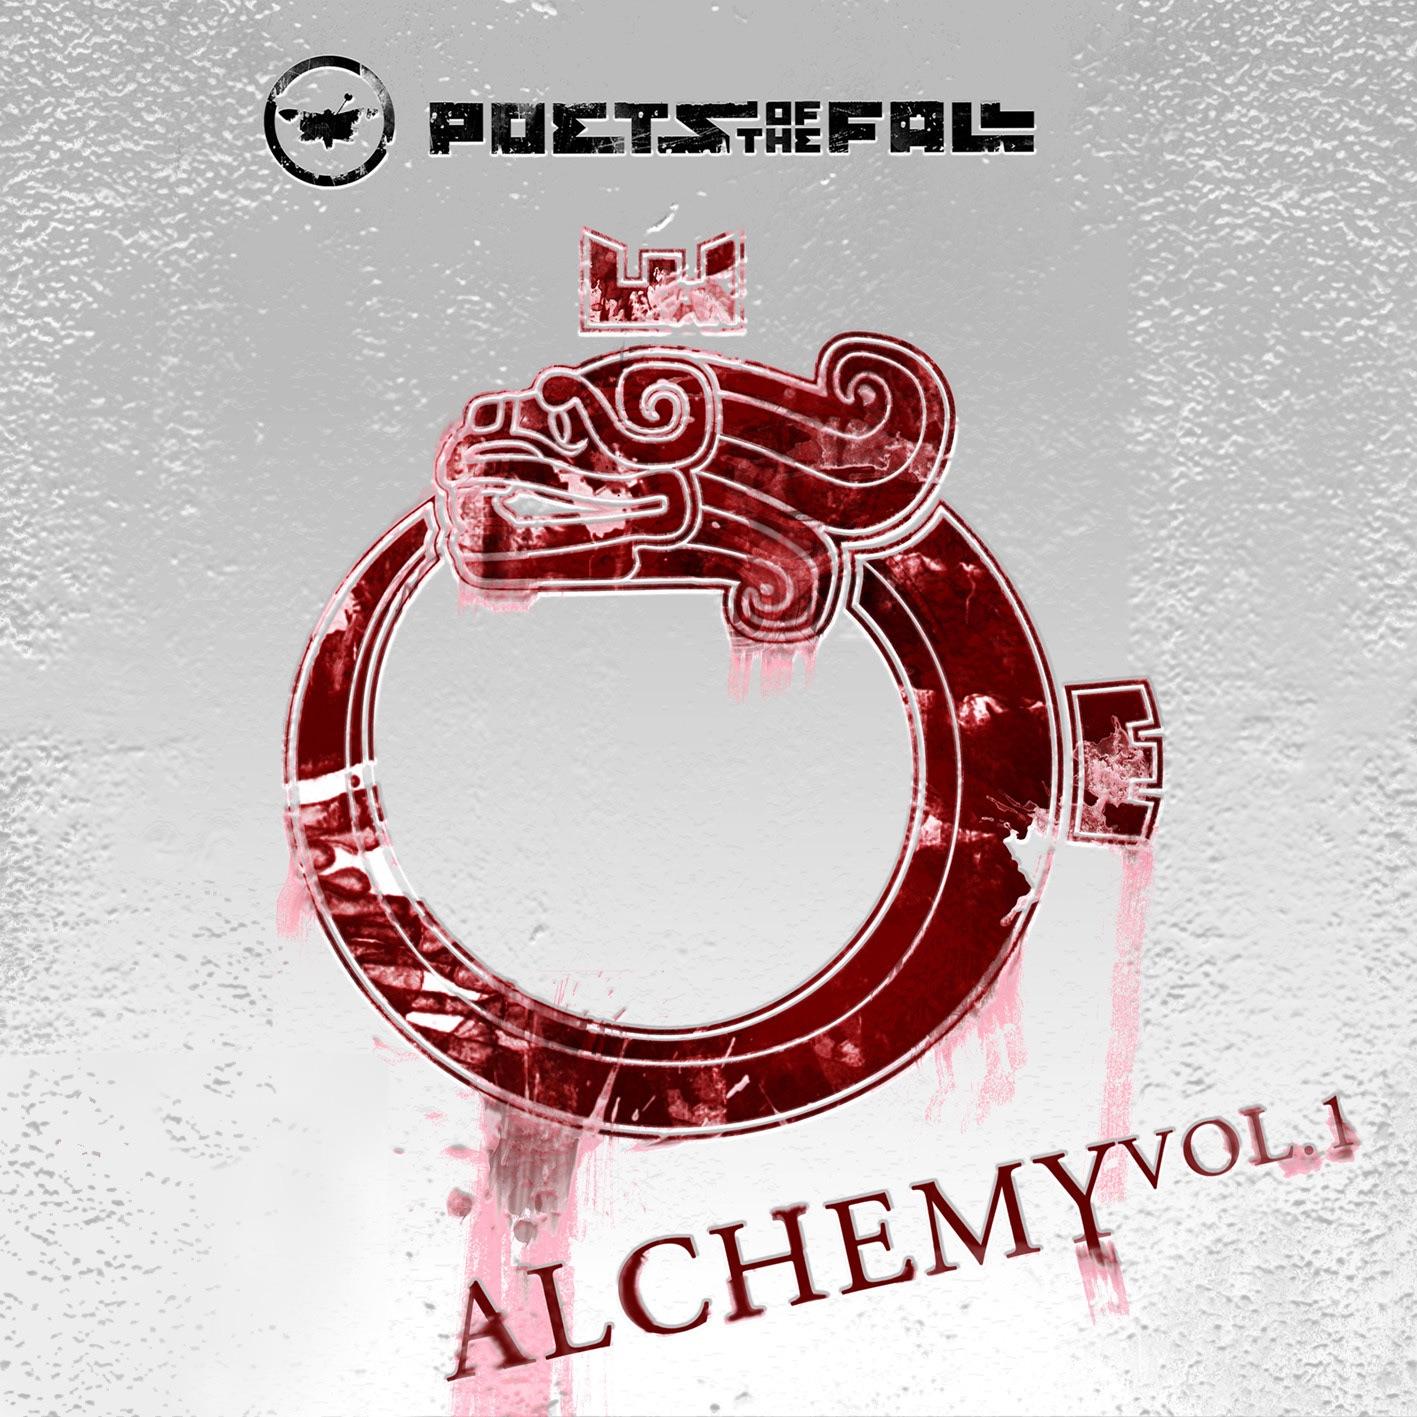 Poets Of The Fall album Alchemy Vol. 1